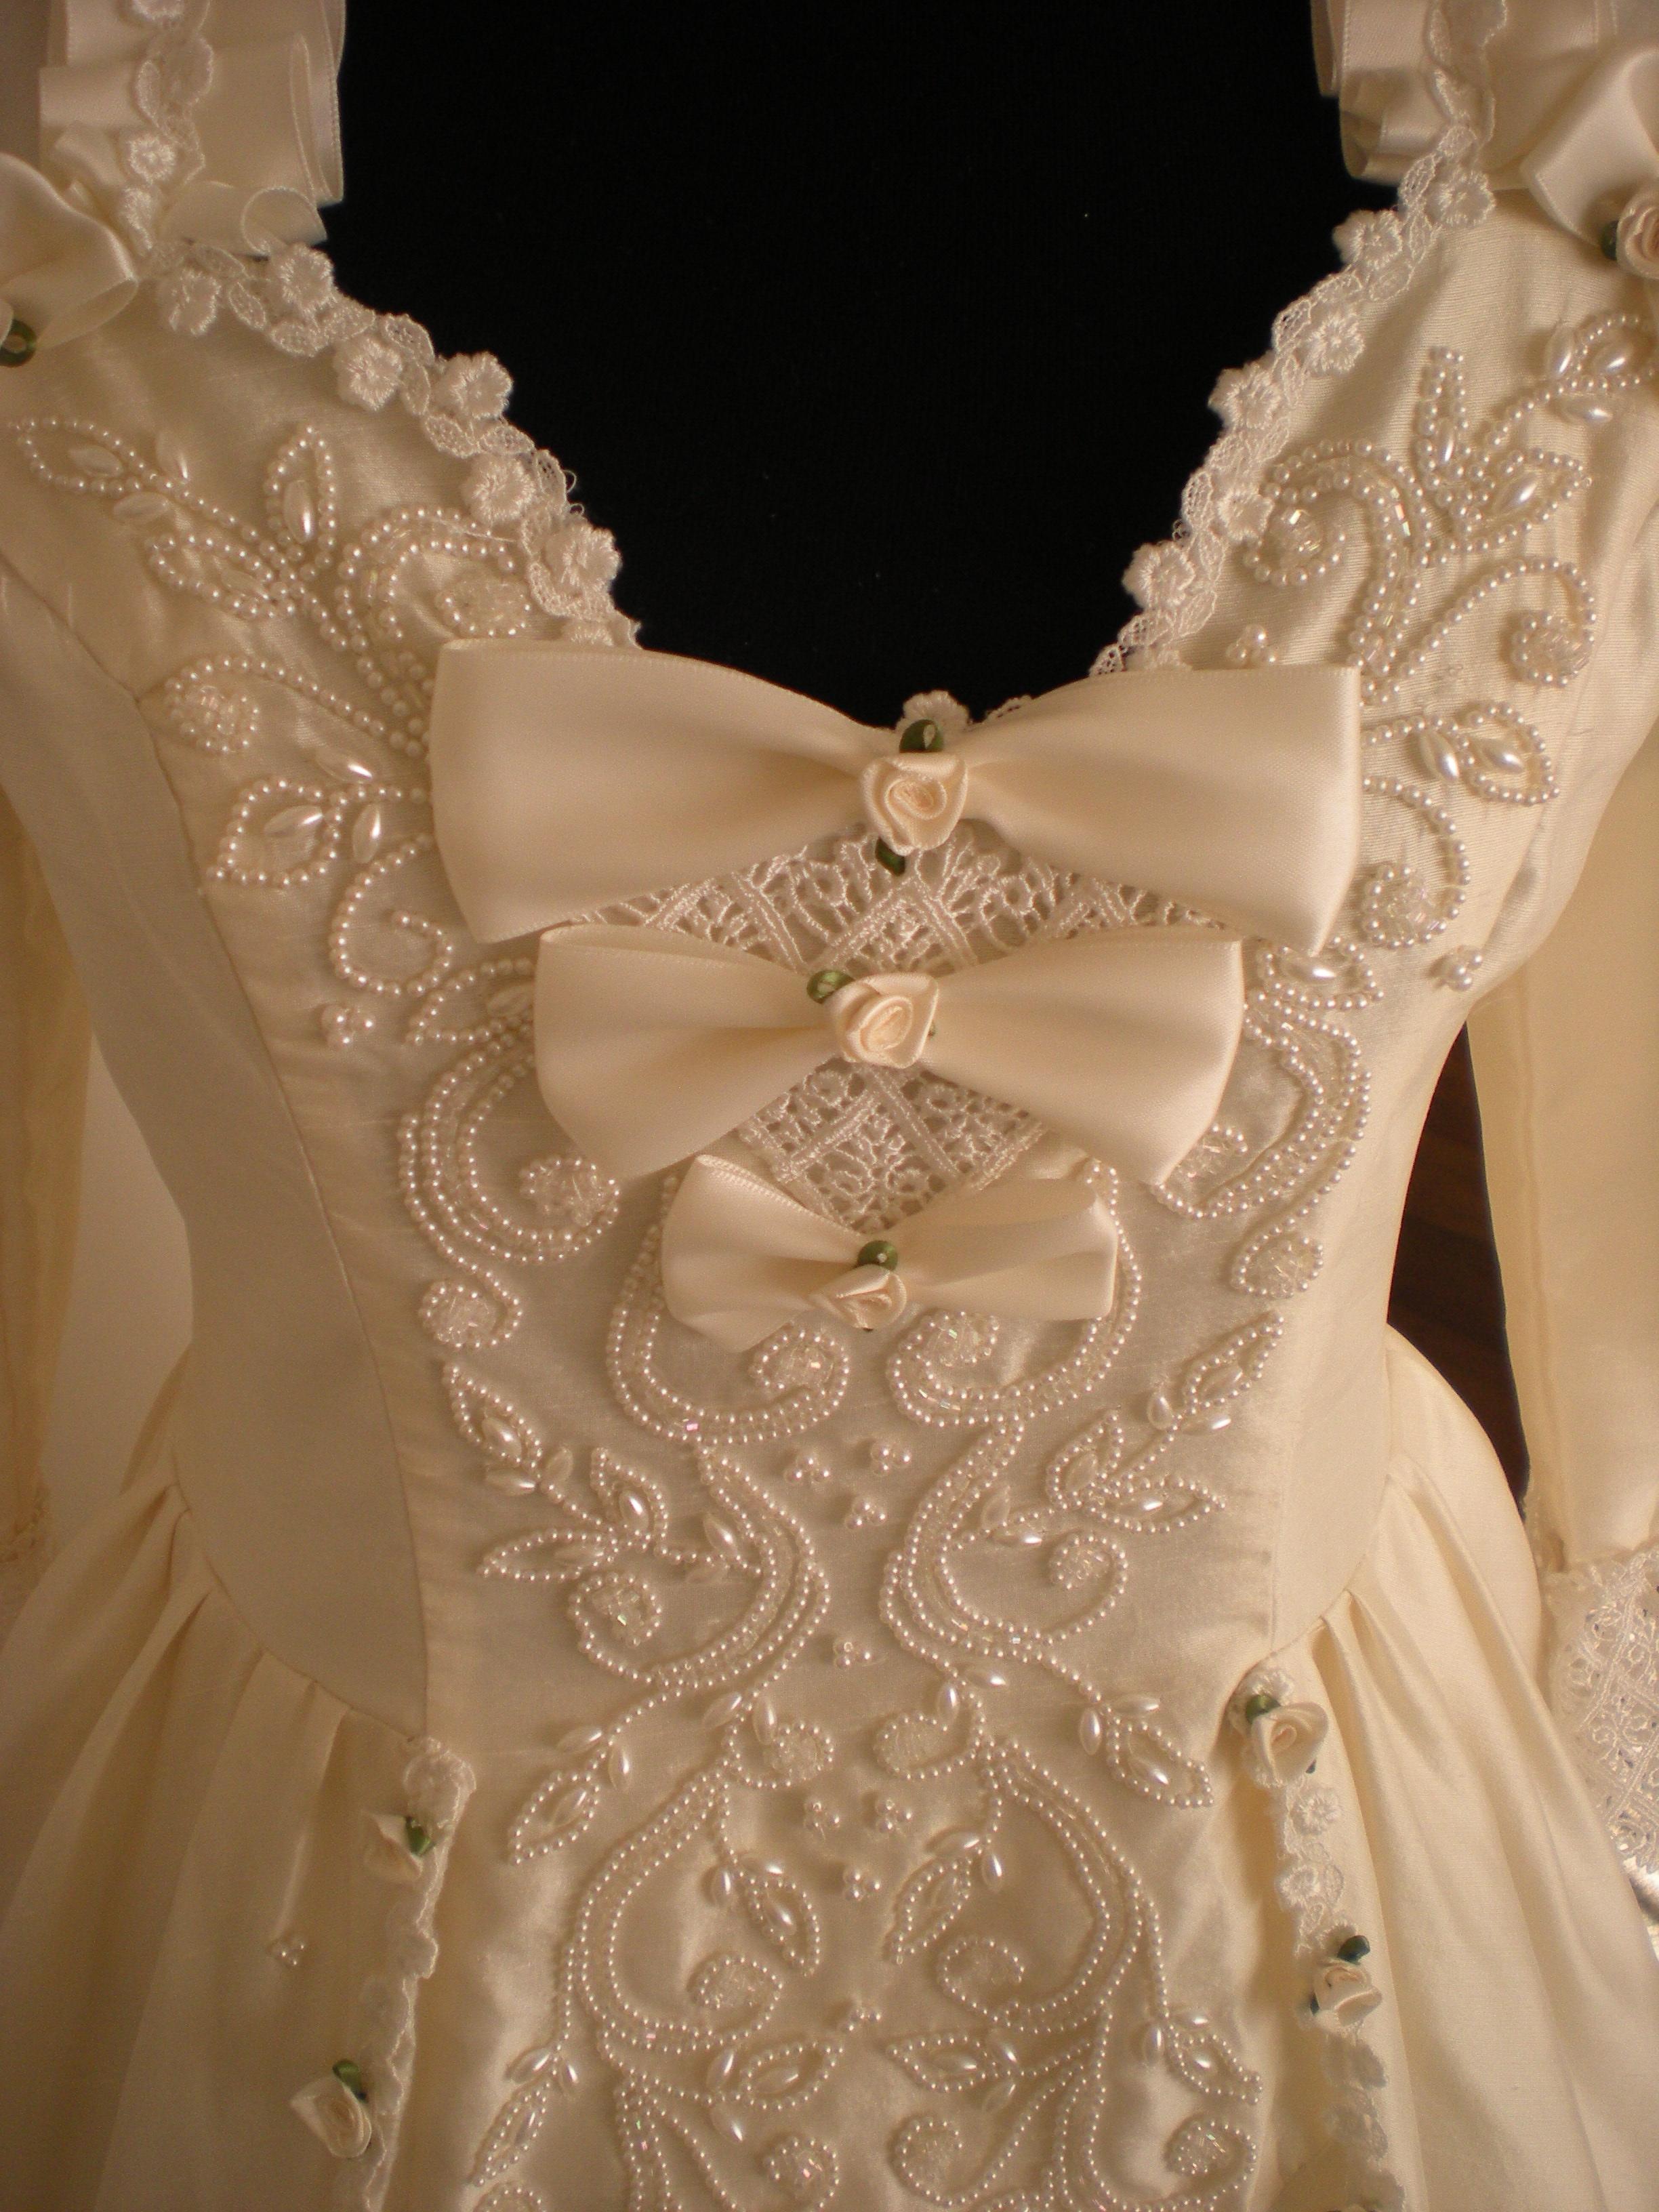 Robe a la Francaise (18th Century Lolita) Dress Project | Fresh Frippery